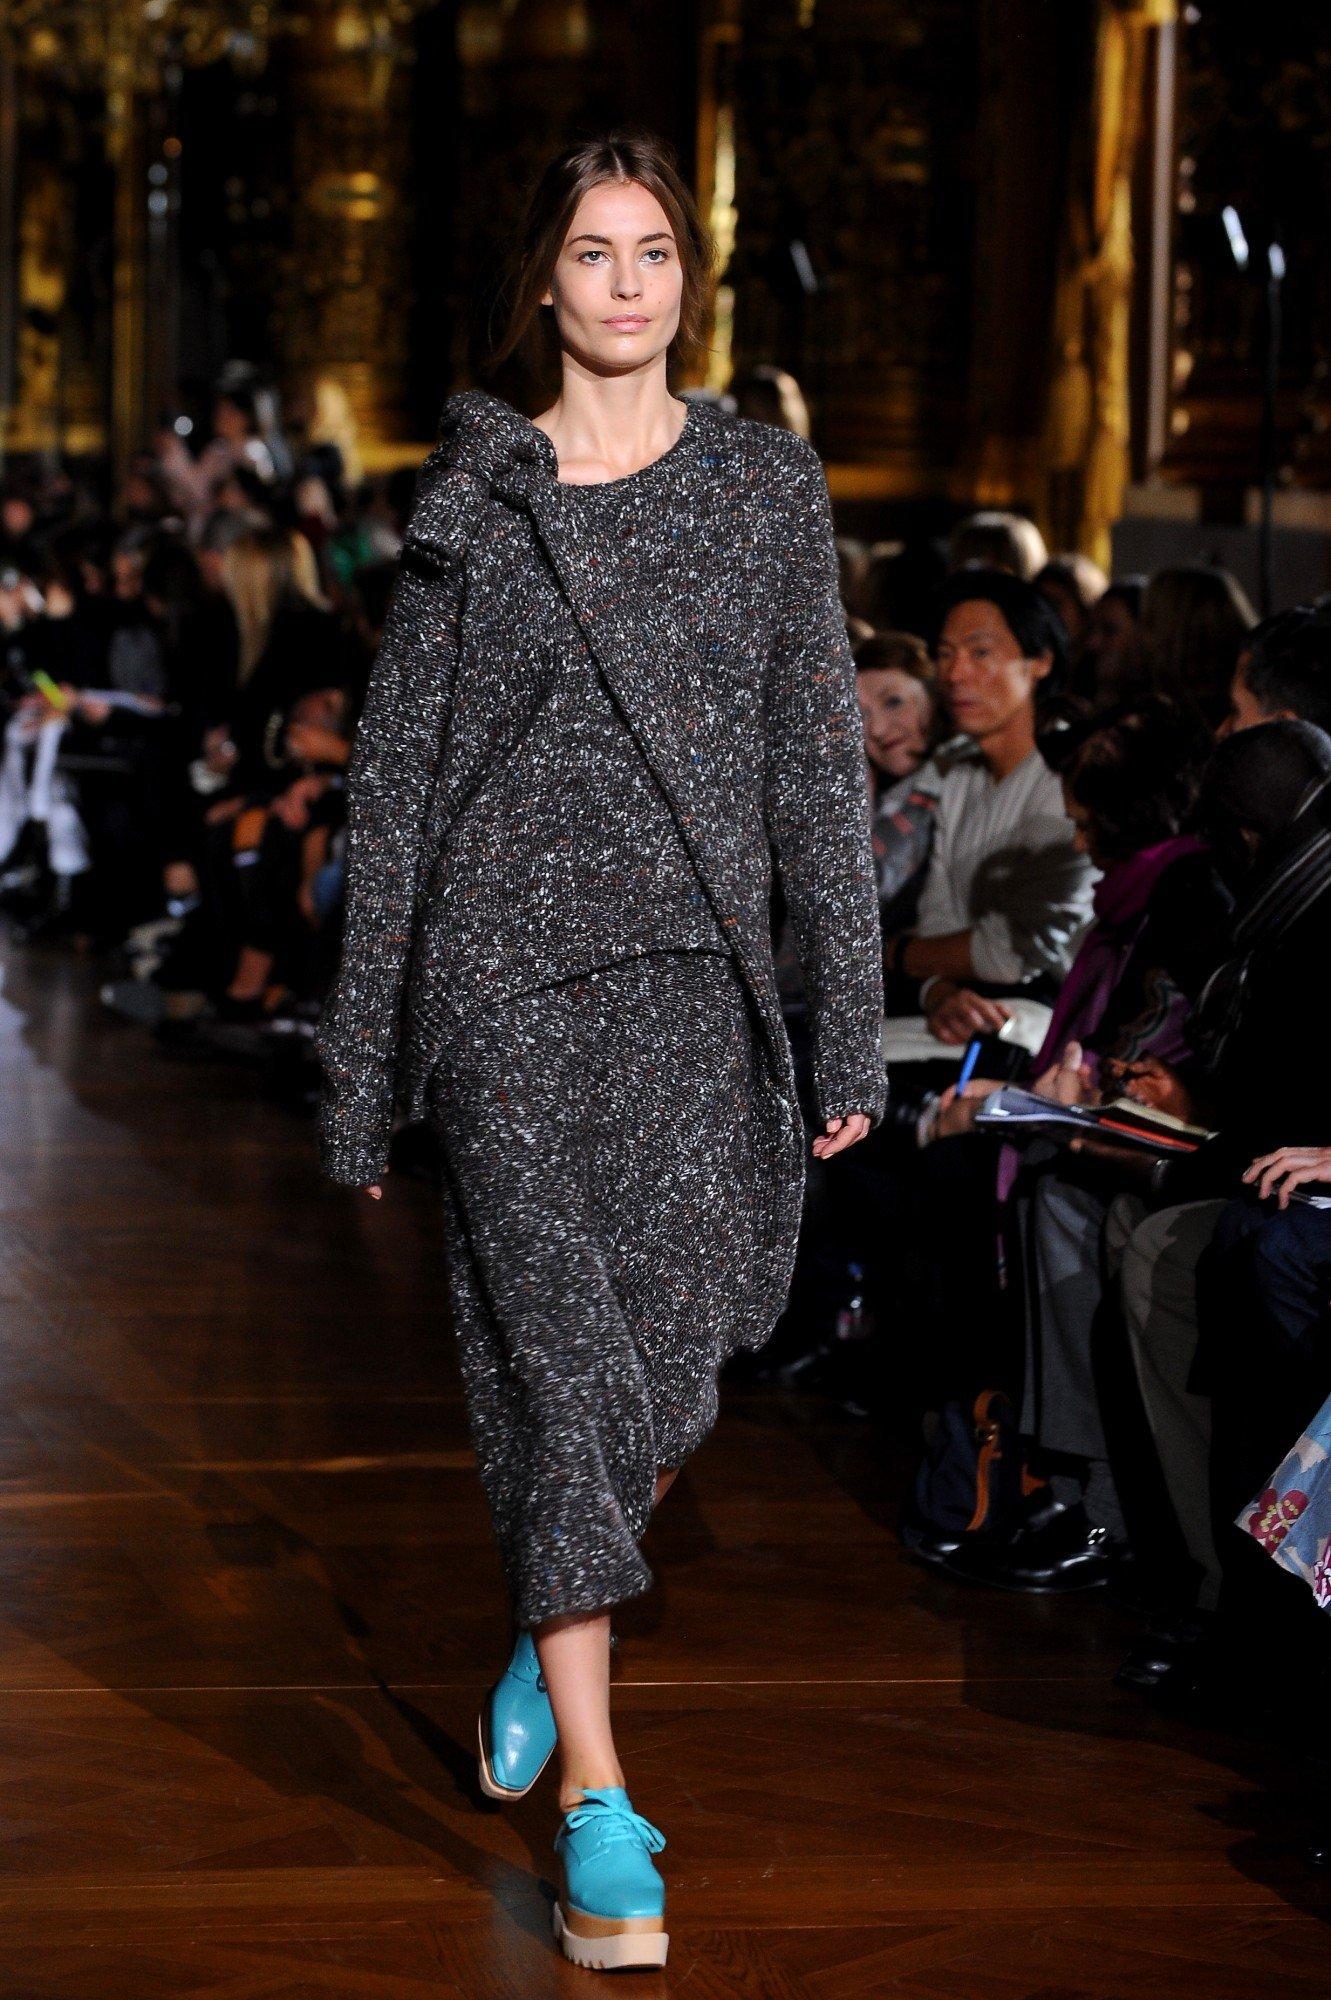 0ff58ba51 <> on March 3, 2014 in Paris, France. Desfile Stella McCartney, semana da  moda de Paris – Francois Durand